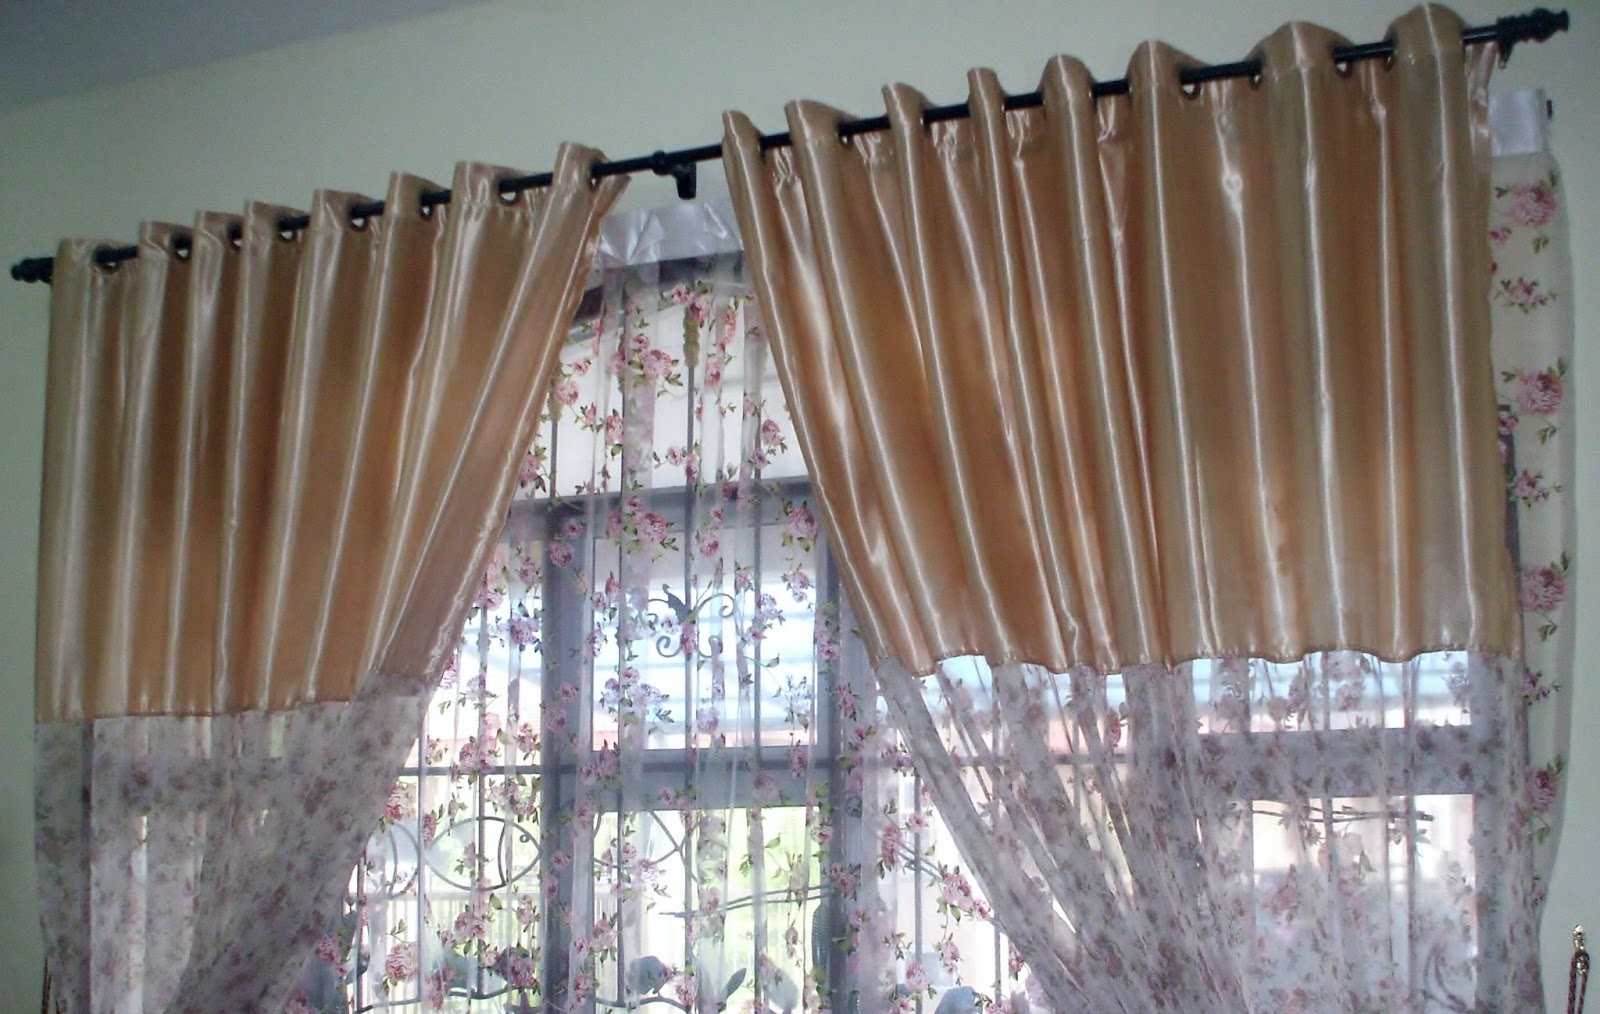 IdaMan Curtain n Railing: March 2013